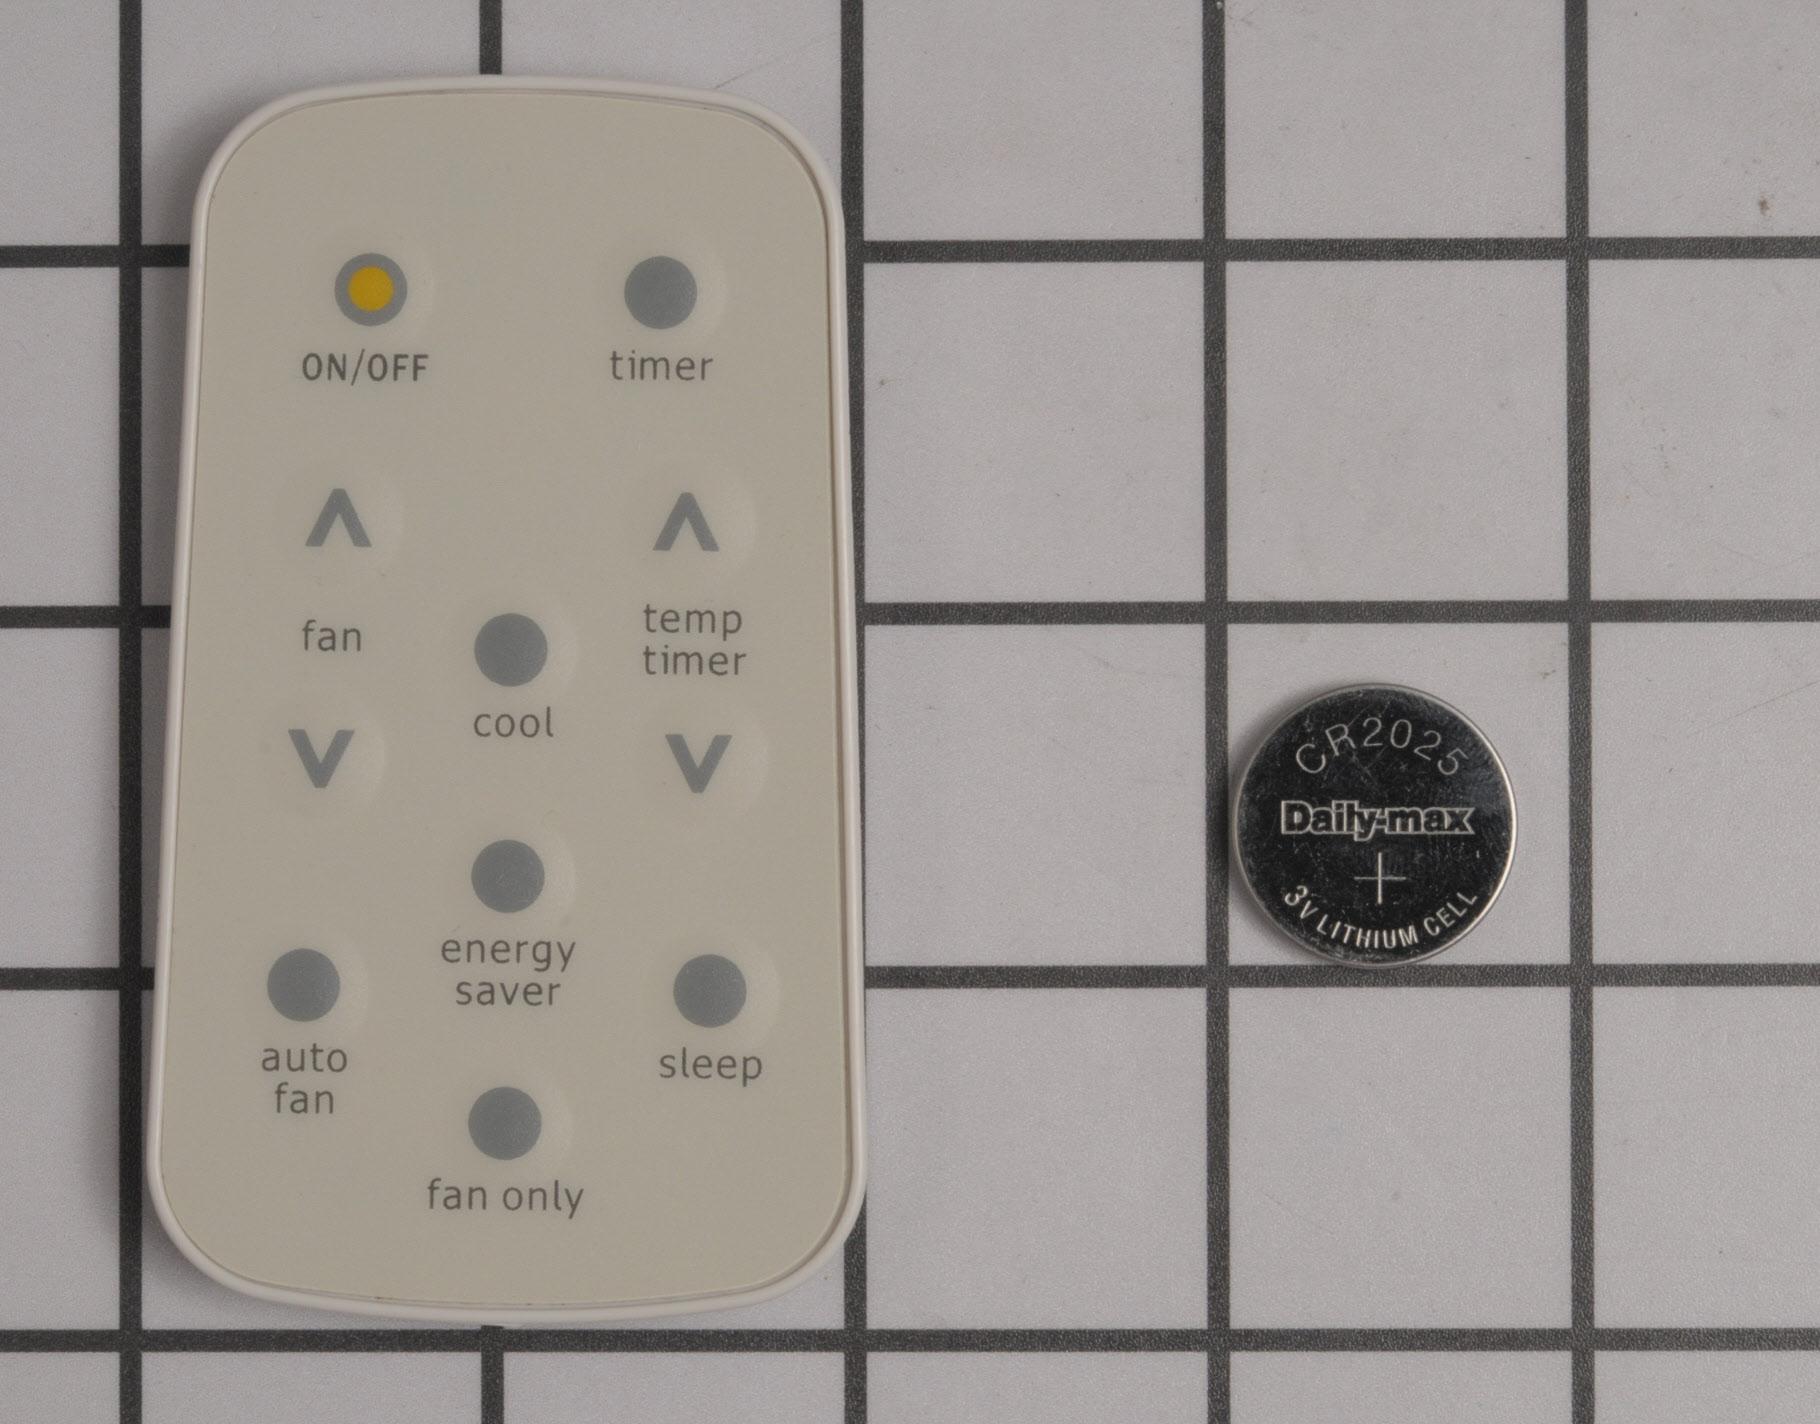 Frigidaire Air Conditioner Part # 5304472214 - Remote Control